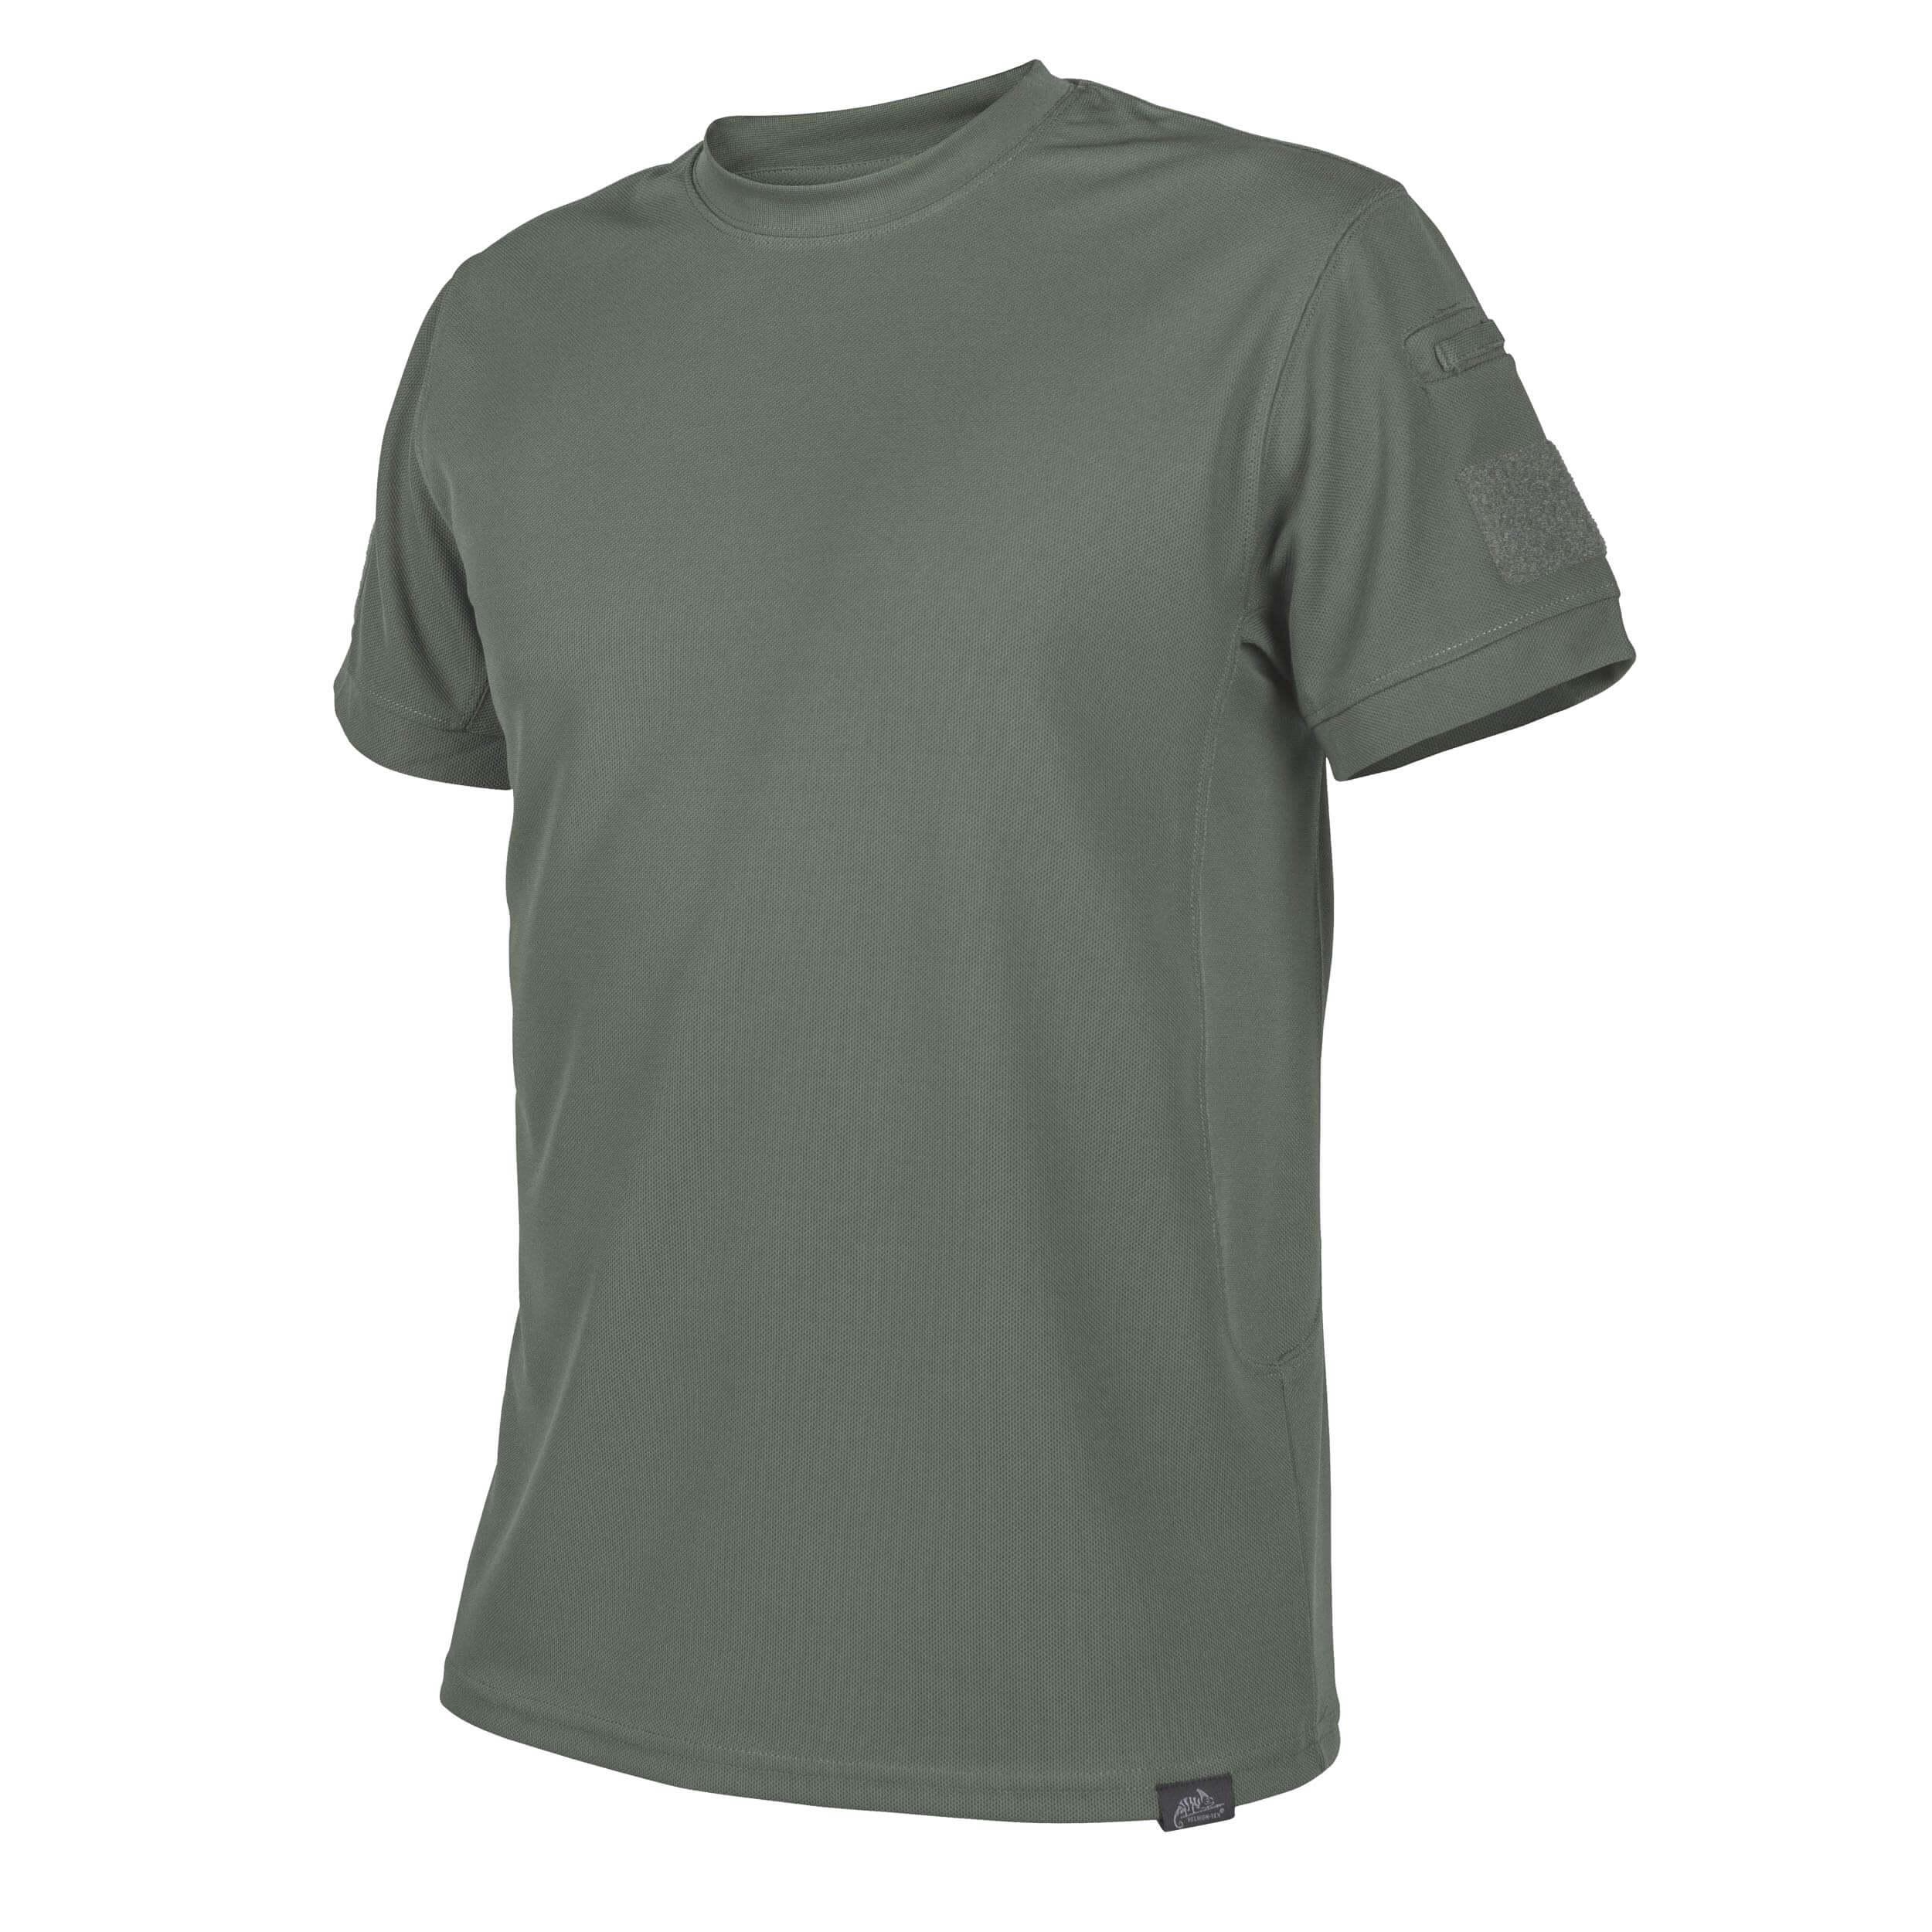 Helikon-Tex Tactical T-Shirt -Top Cool- Foliage Green